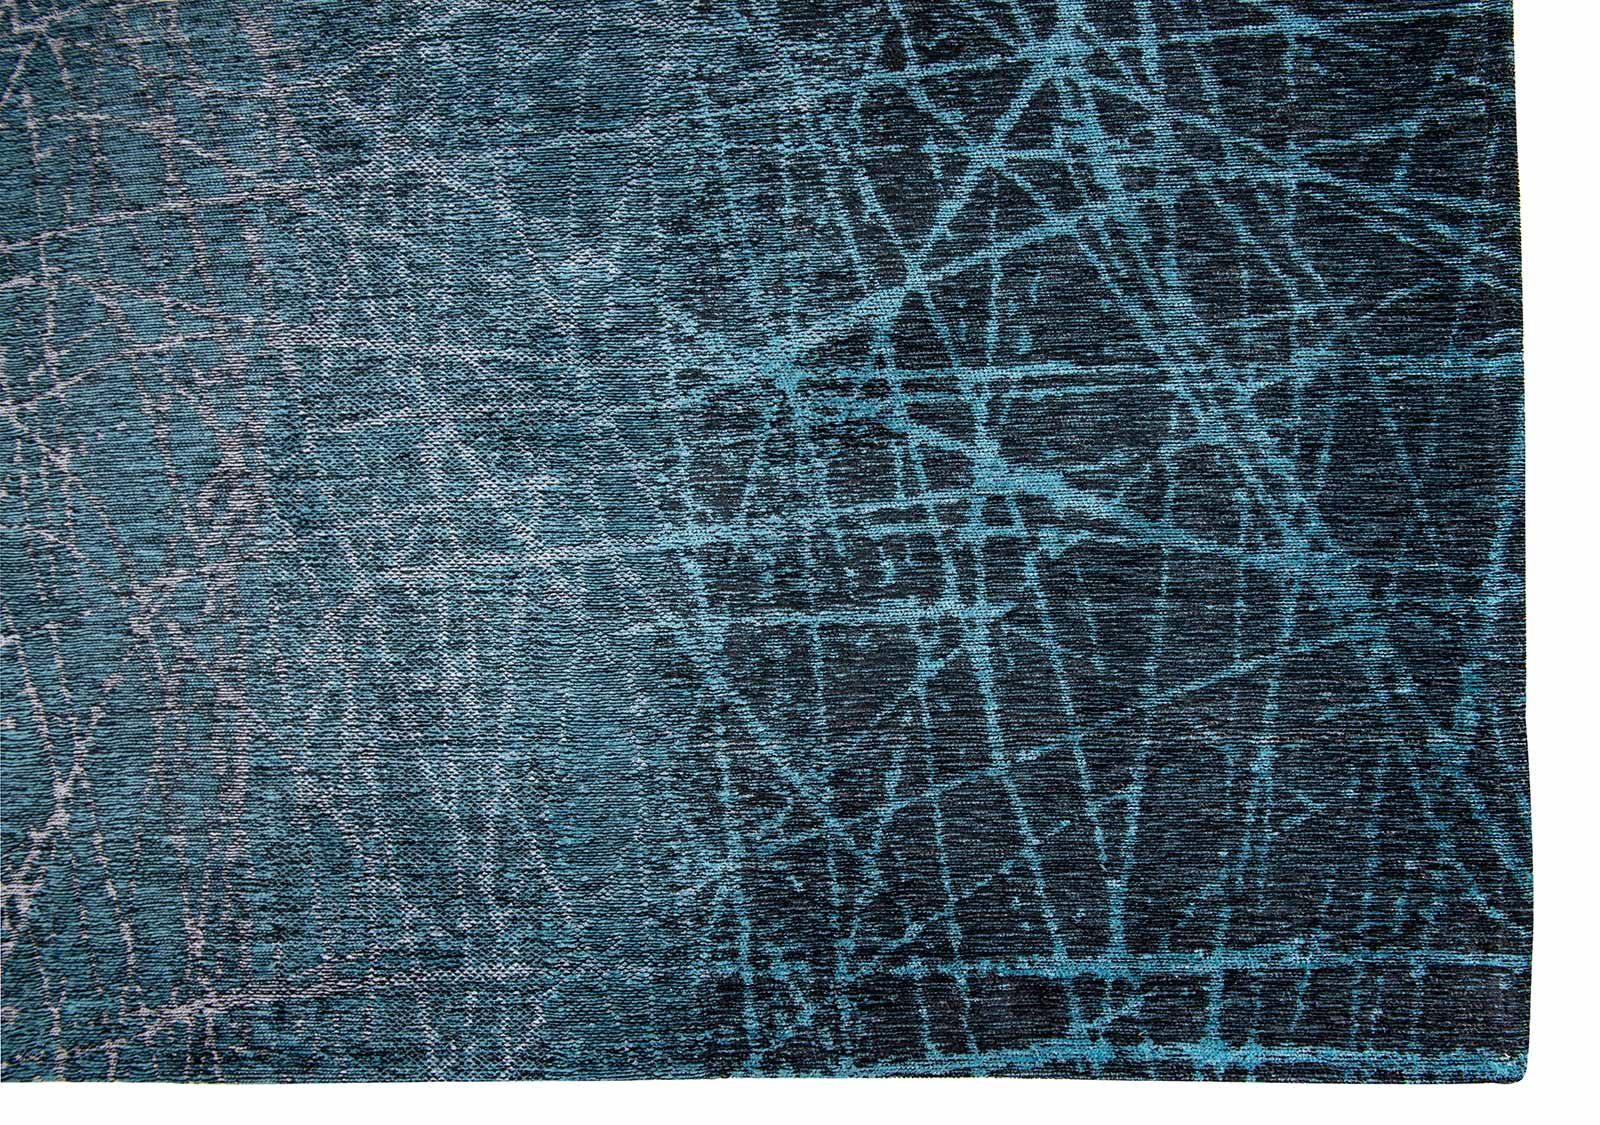 alfombras Louis De Poortere LX 8877 Mad Men Fahrenheit Polar Vortex corner